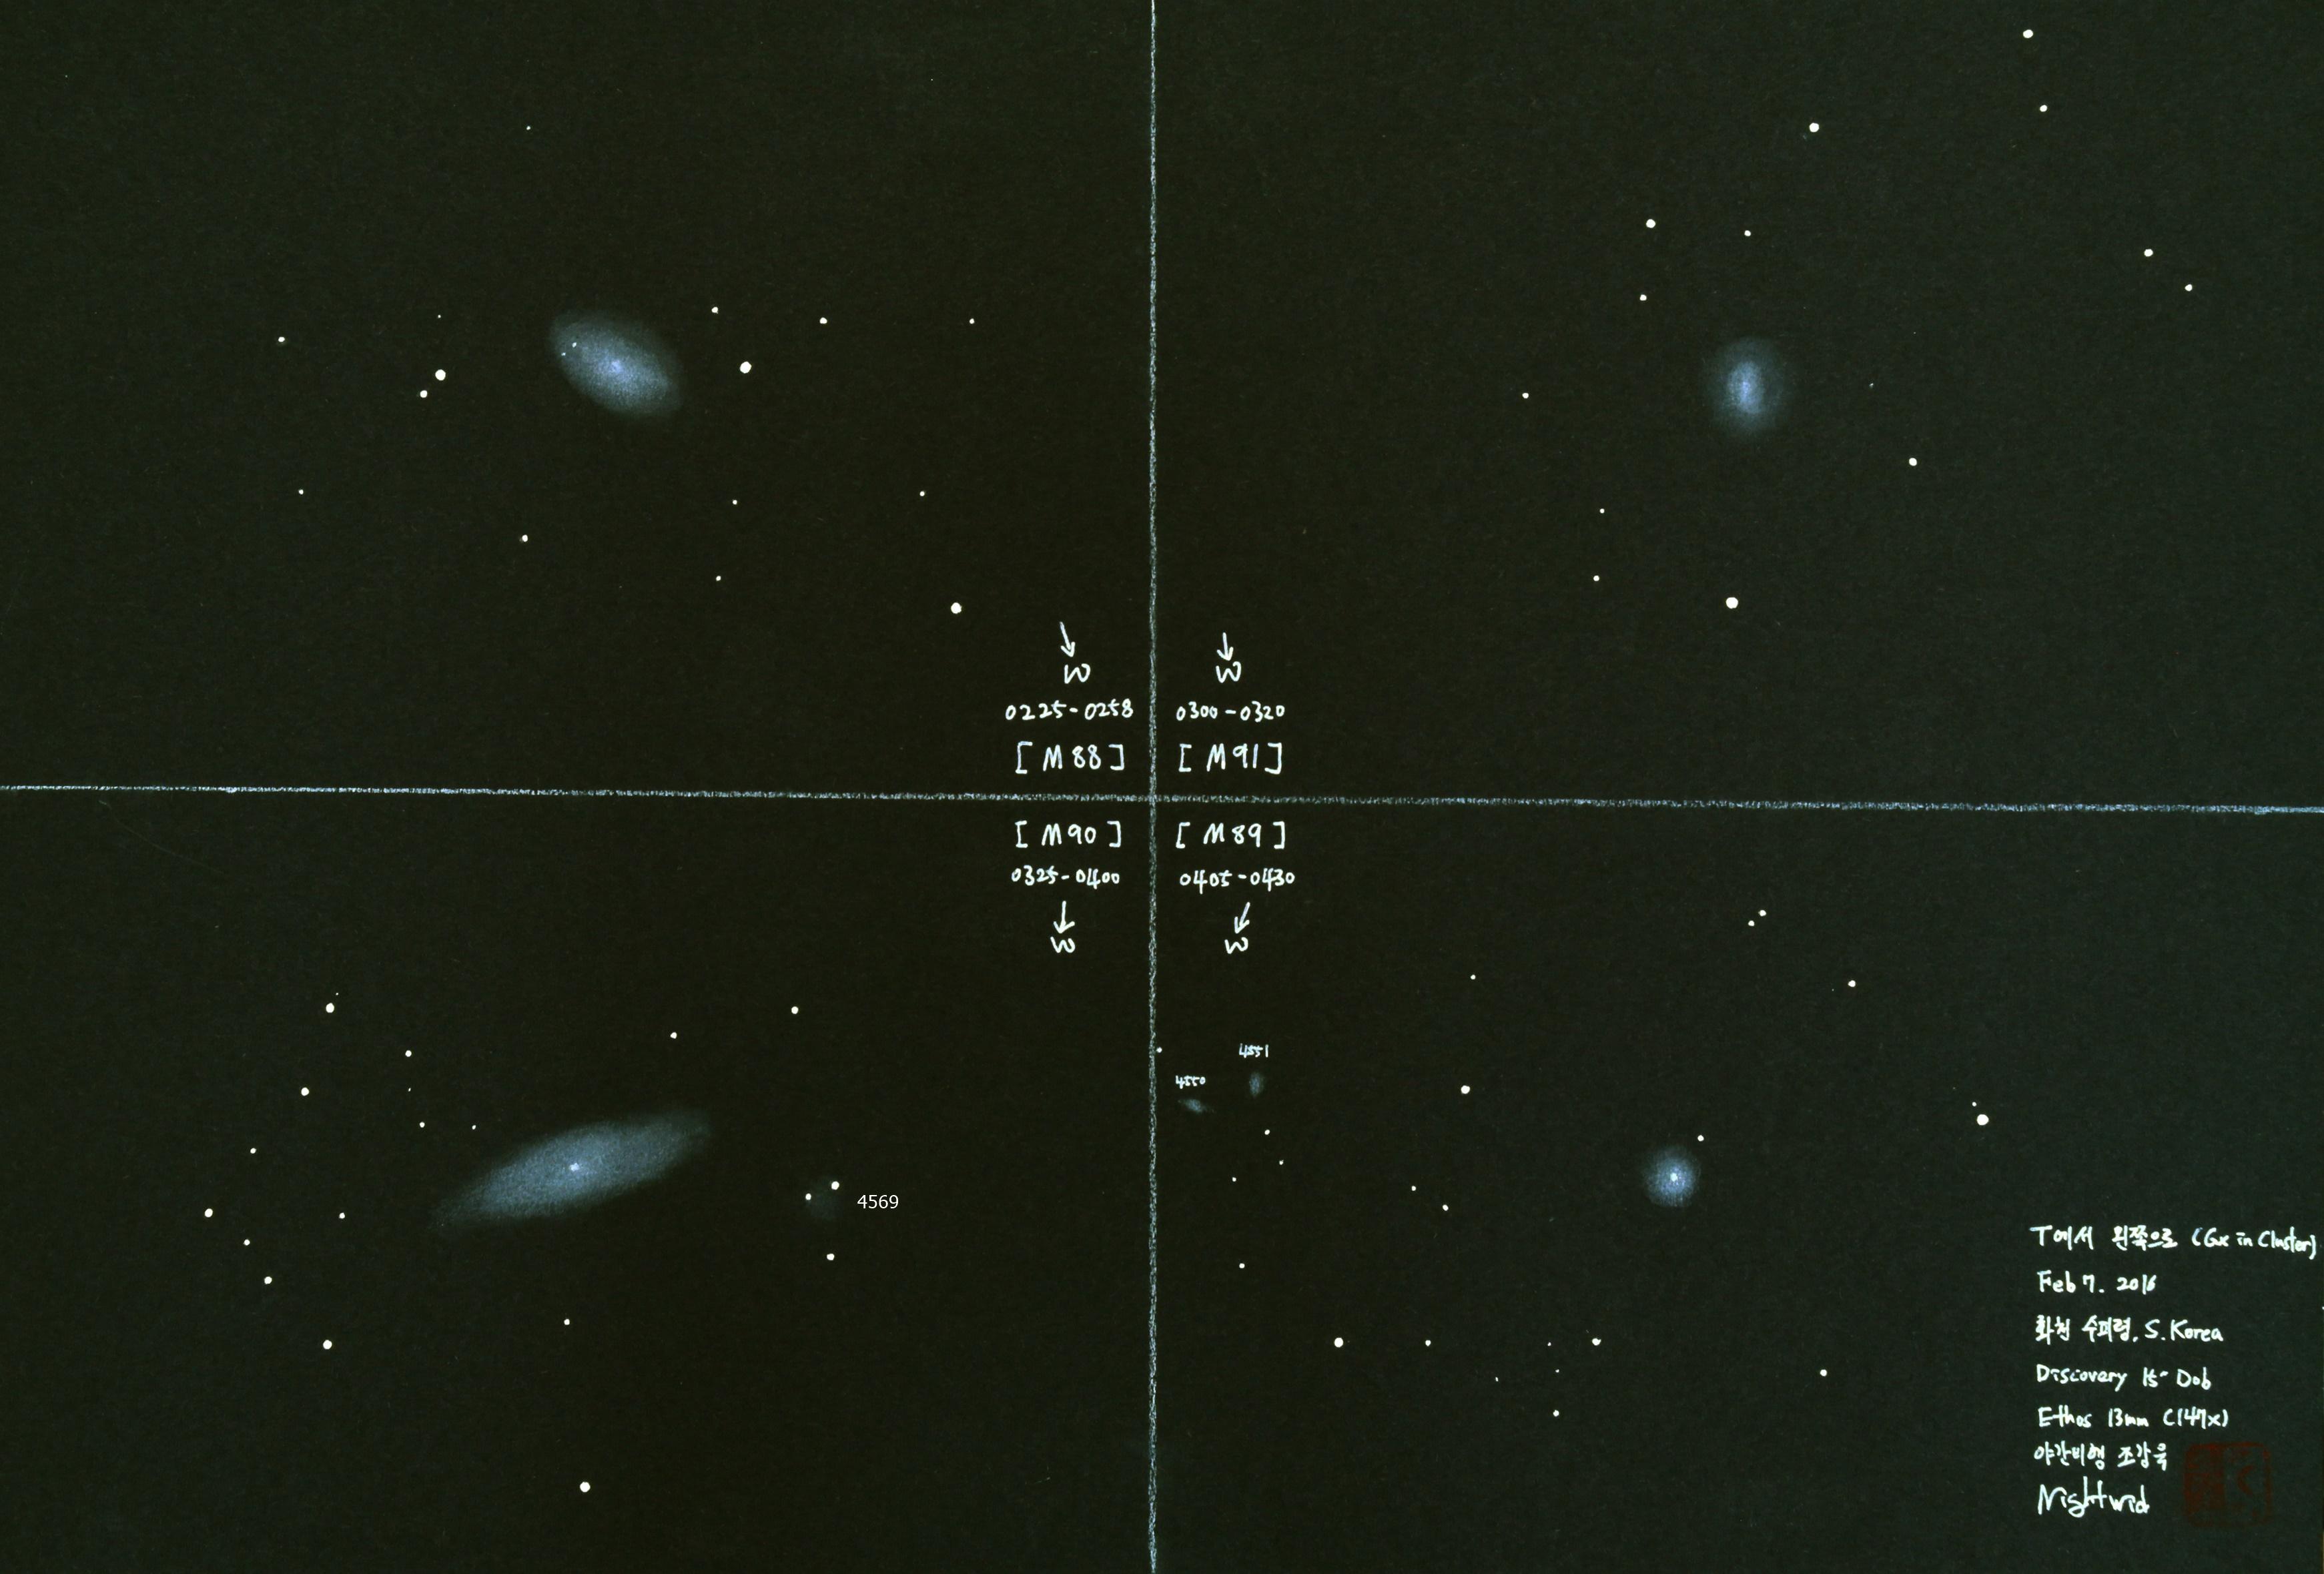 M88_91_90_89.JPG